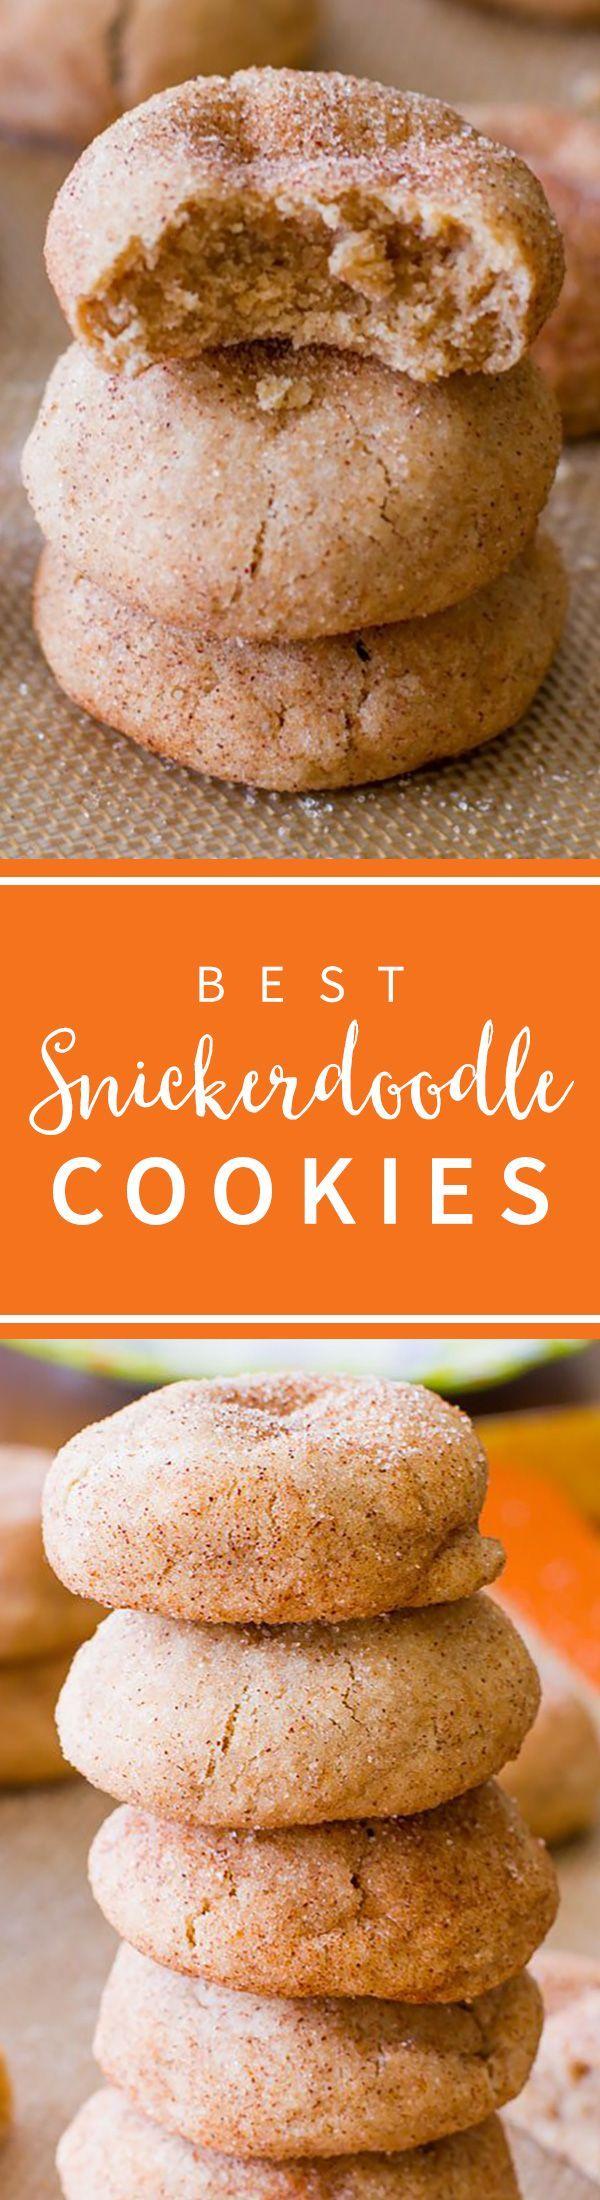 Soft and thick cinnamon nickerdoodles! Easy snickerdoodle cookie recipe on sallysbakingaddiction.com